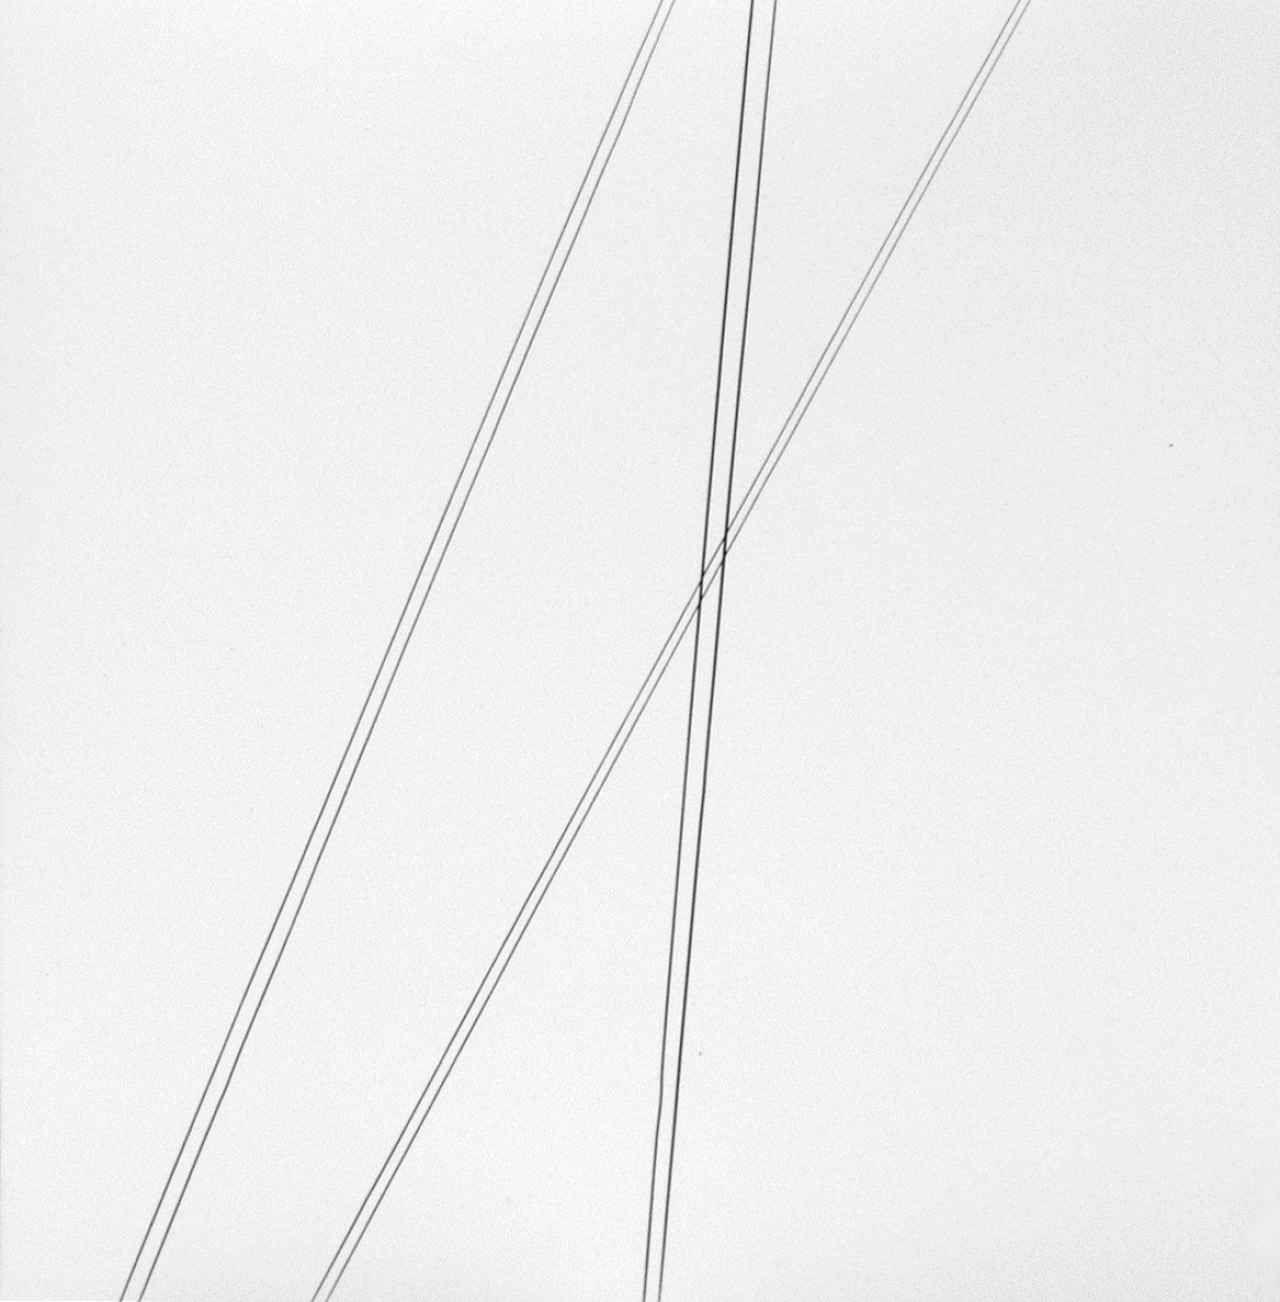 Harry Callahan Telephone Wires